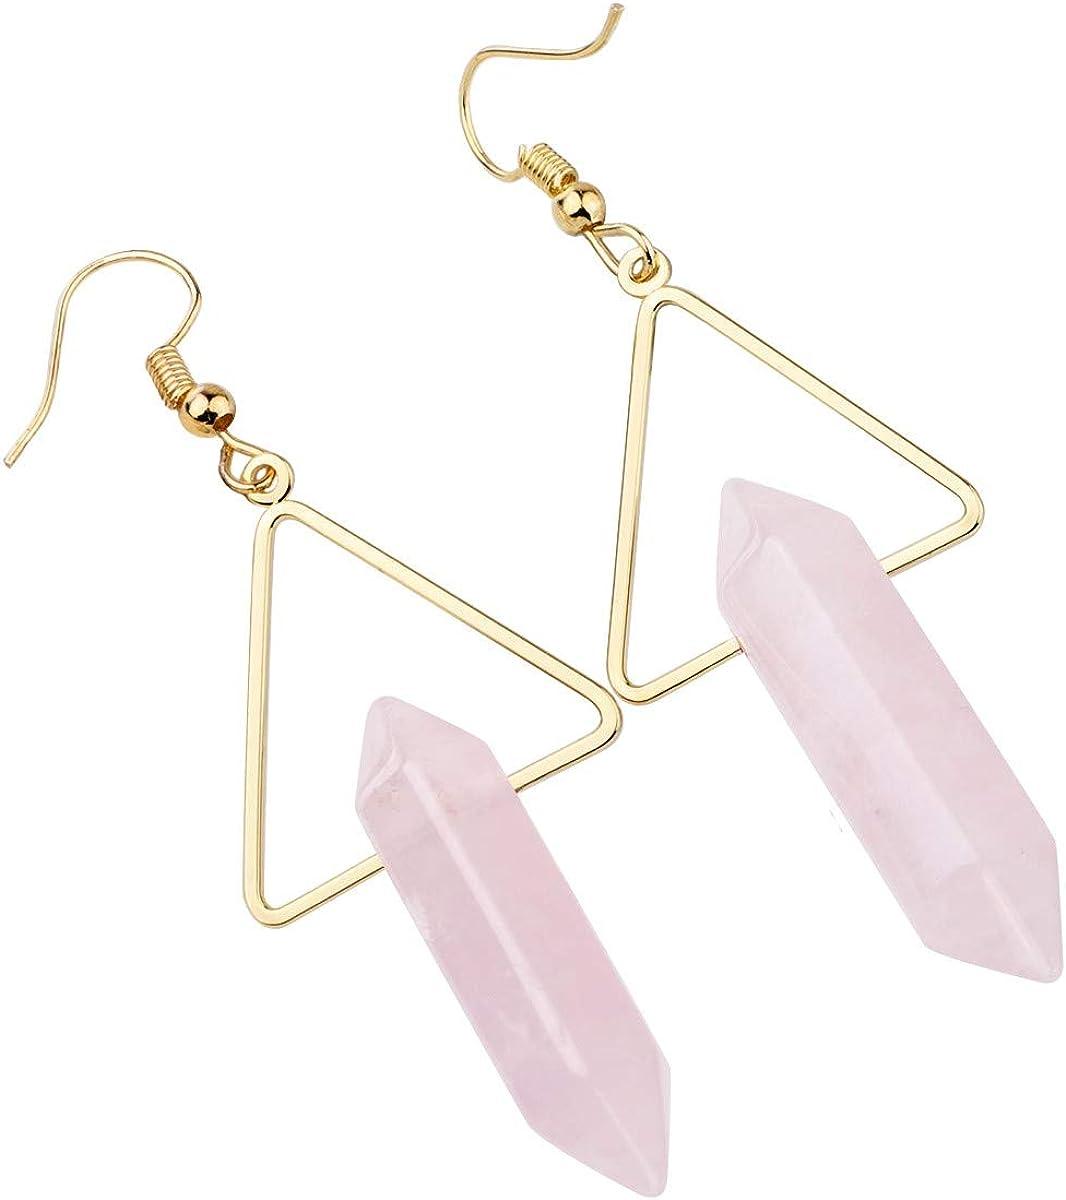 Boho Hippie Chic Style Earrings set multicolored Tourmaline Gemstone Beaded Dangle Earrings Rose /& Pink Quartz Beads Spirit Amethyst